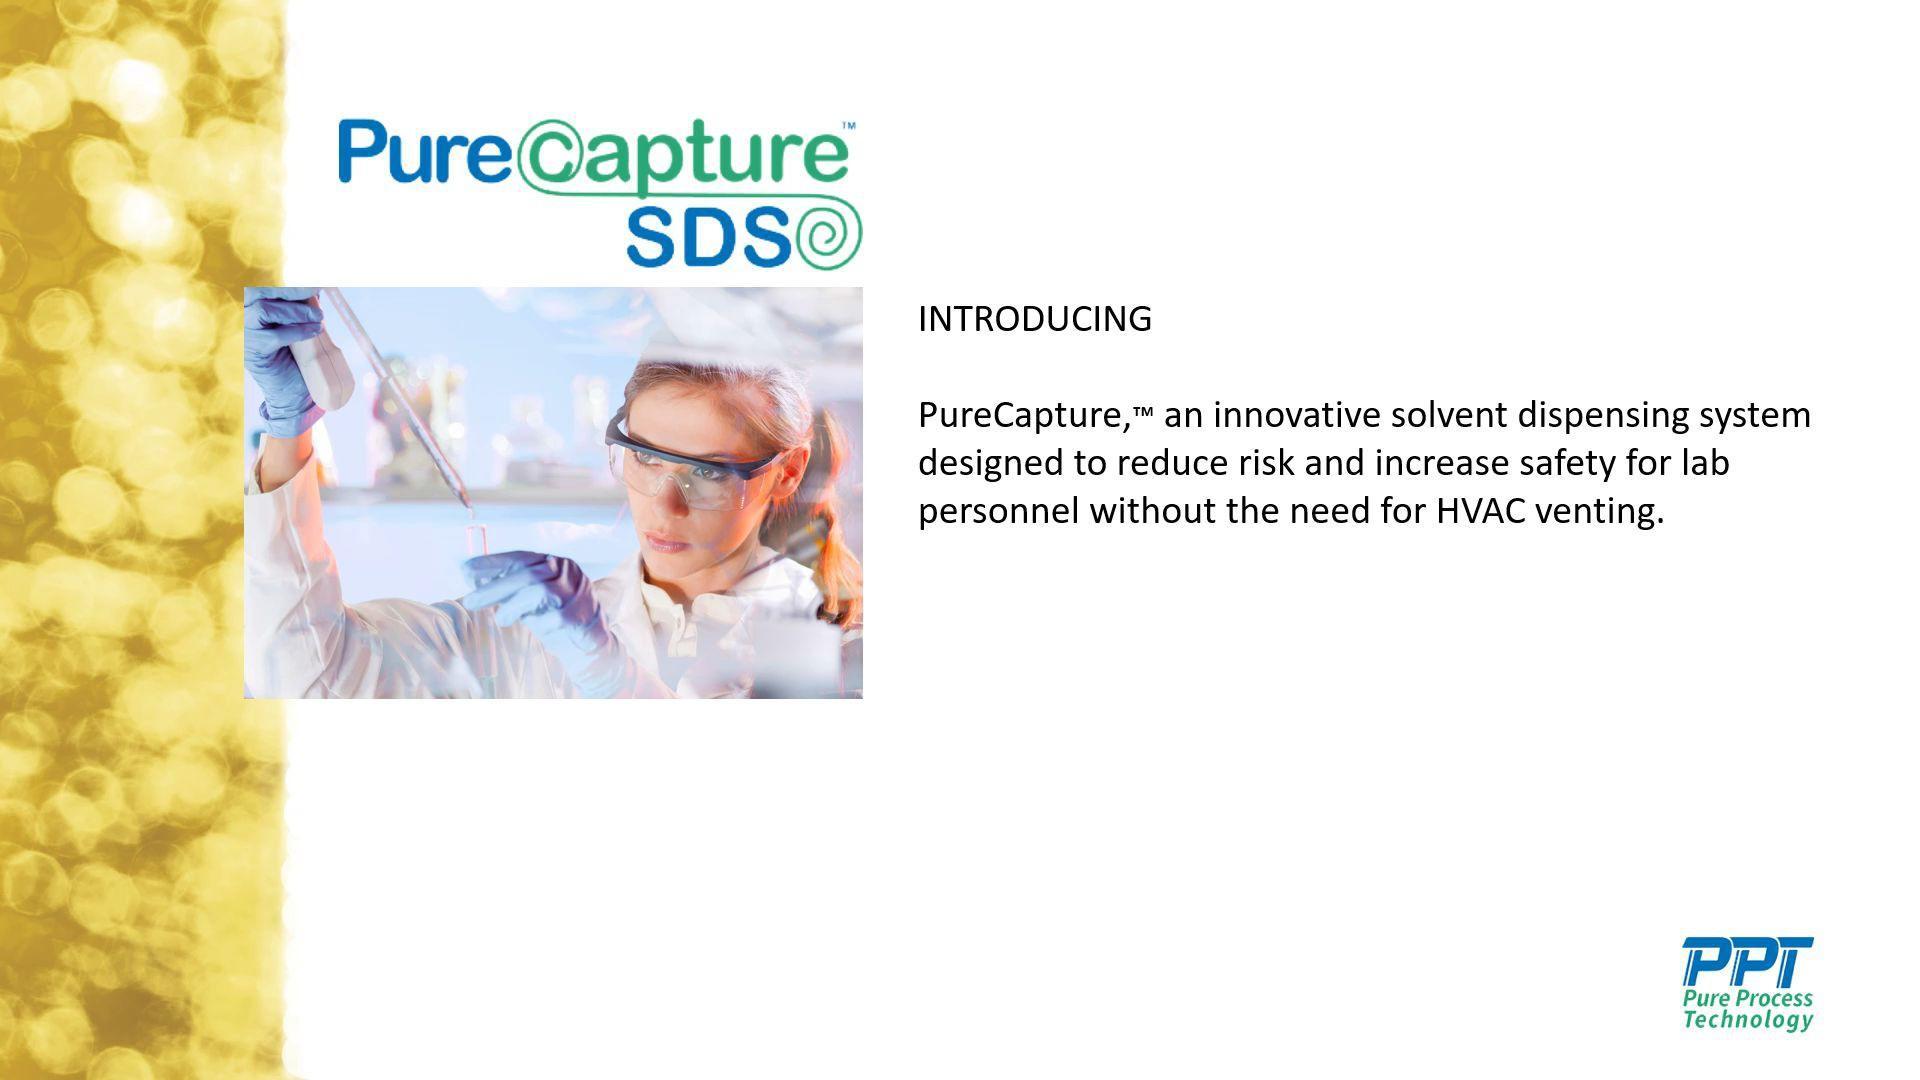 PureCapture Solvent Dispensing System